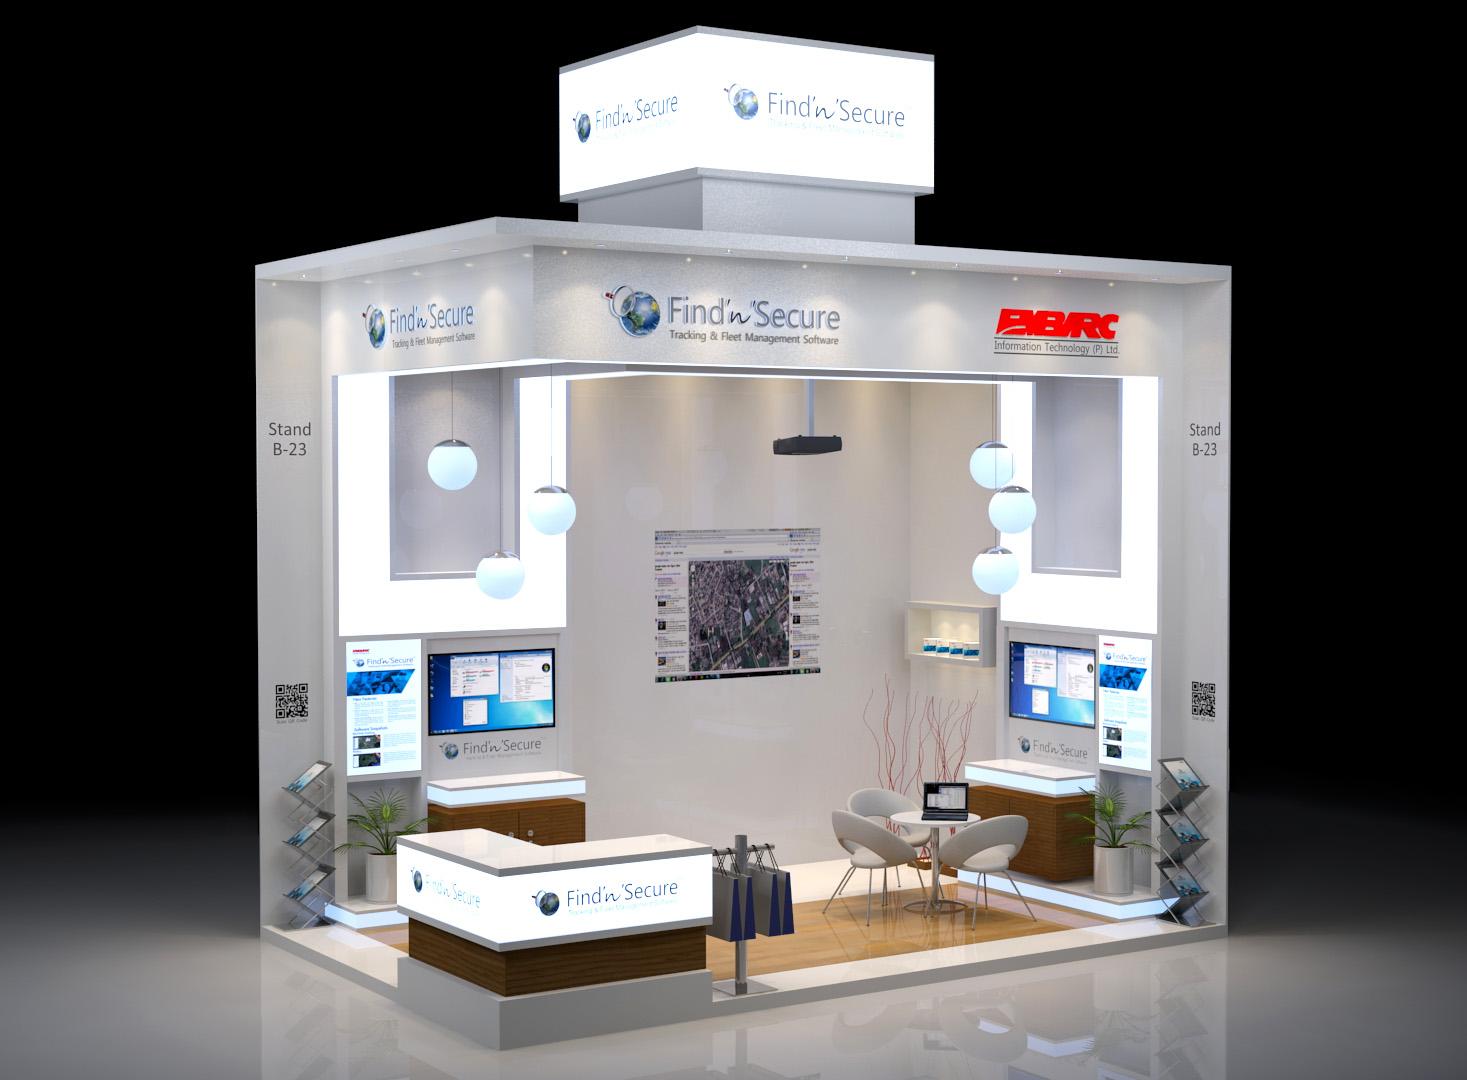 Exhibition Stand Drawing : Exhibition stand design by manindar on deviantart